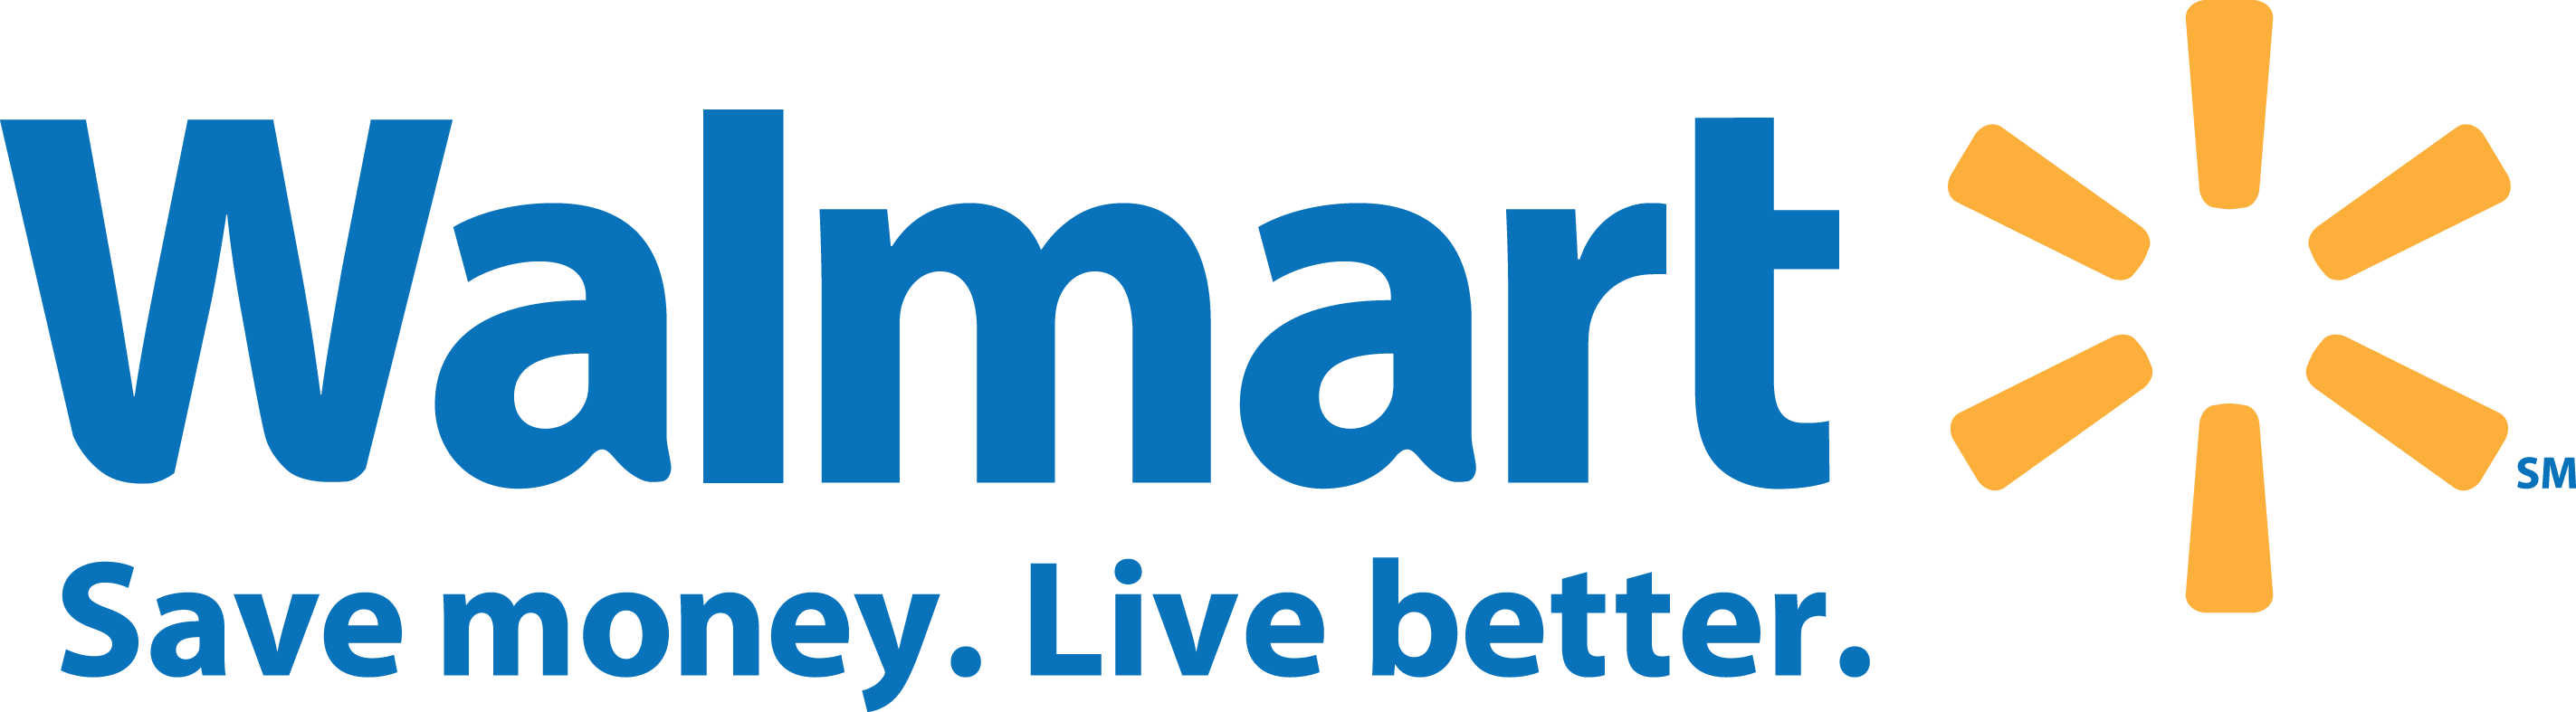 логотип бренда Wal-Mart